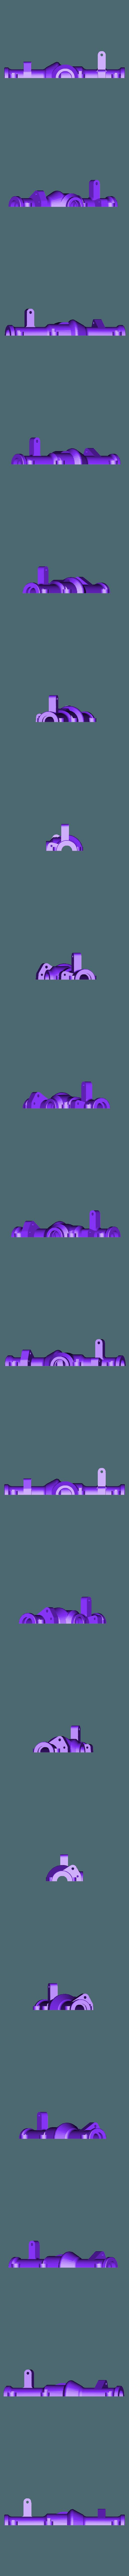 Truck_V4_Axle_Rear_Single_Top.STL Download STL file 3D Printed Rc Truck V4 • 3D printable template, MrCrankyface